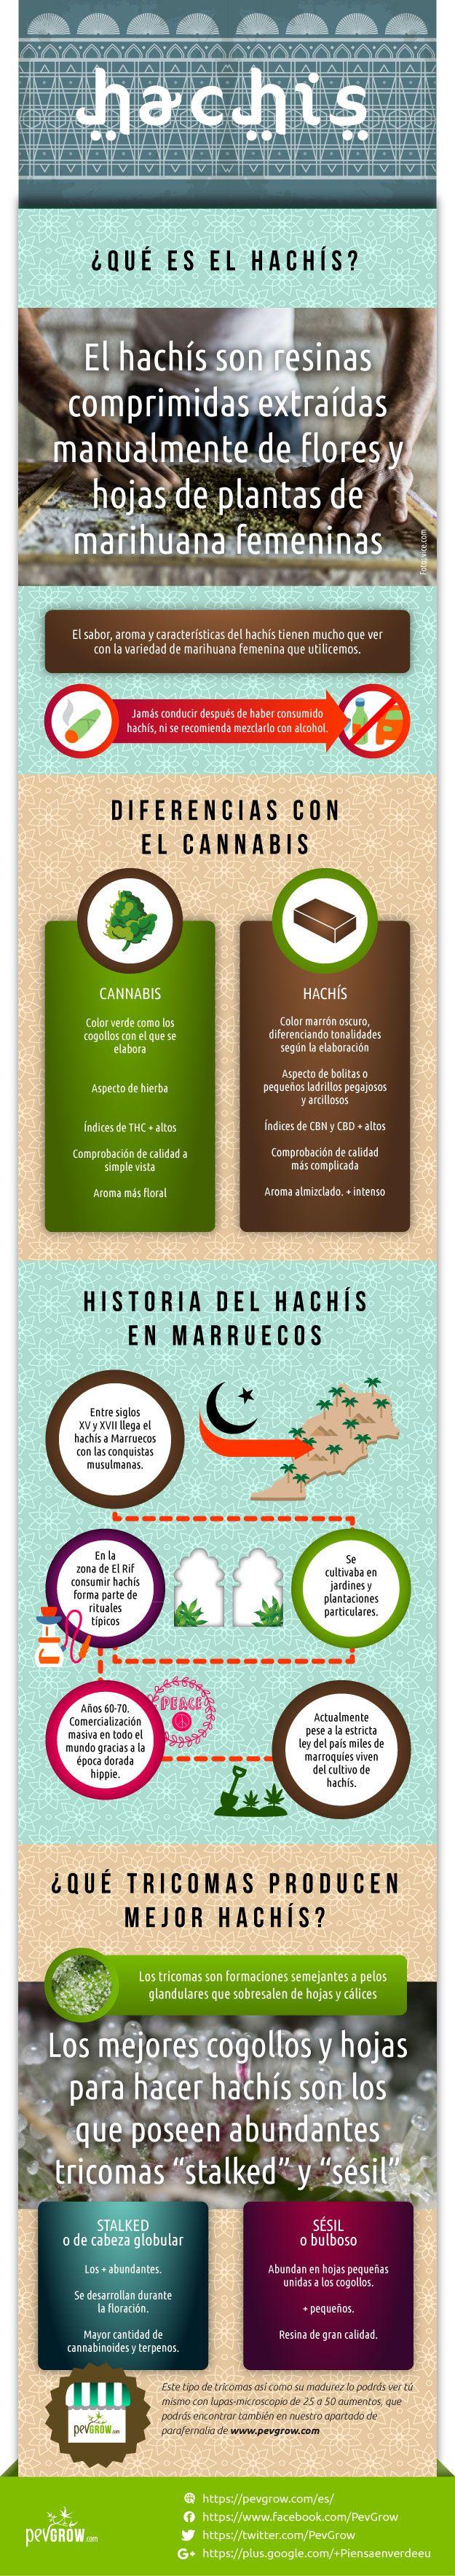 Infografia sobre el hachís